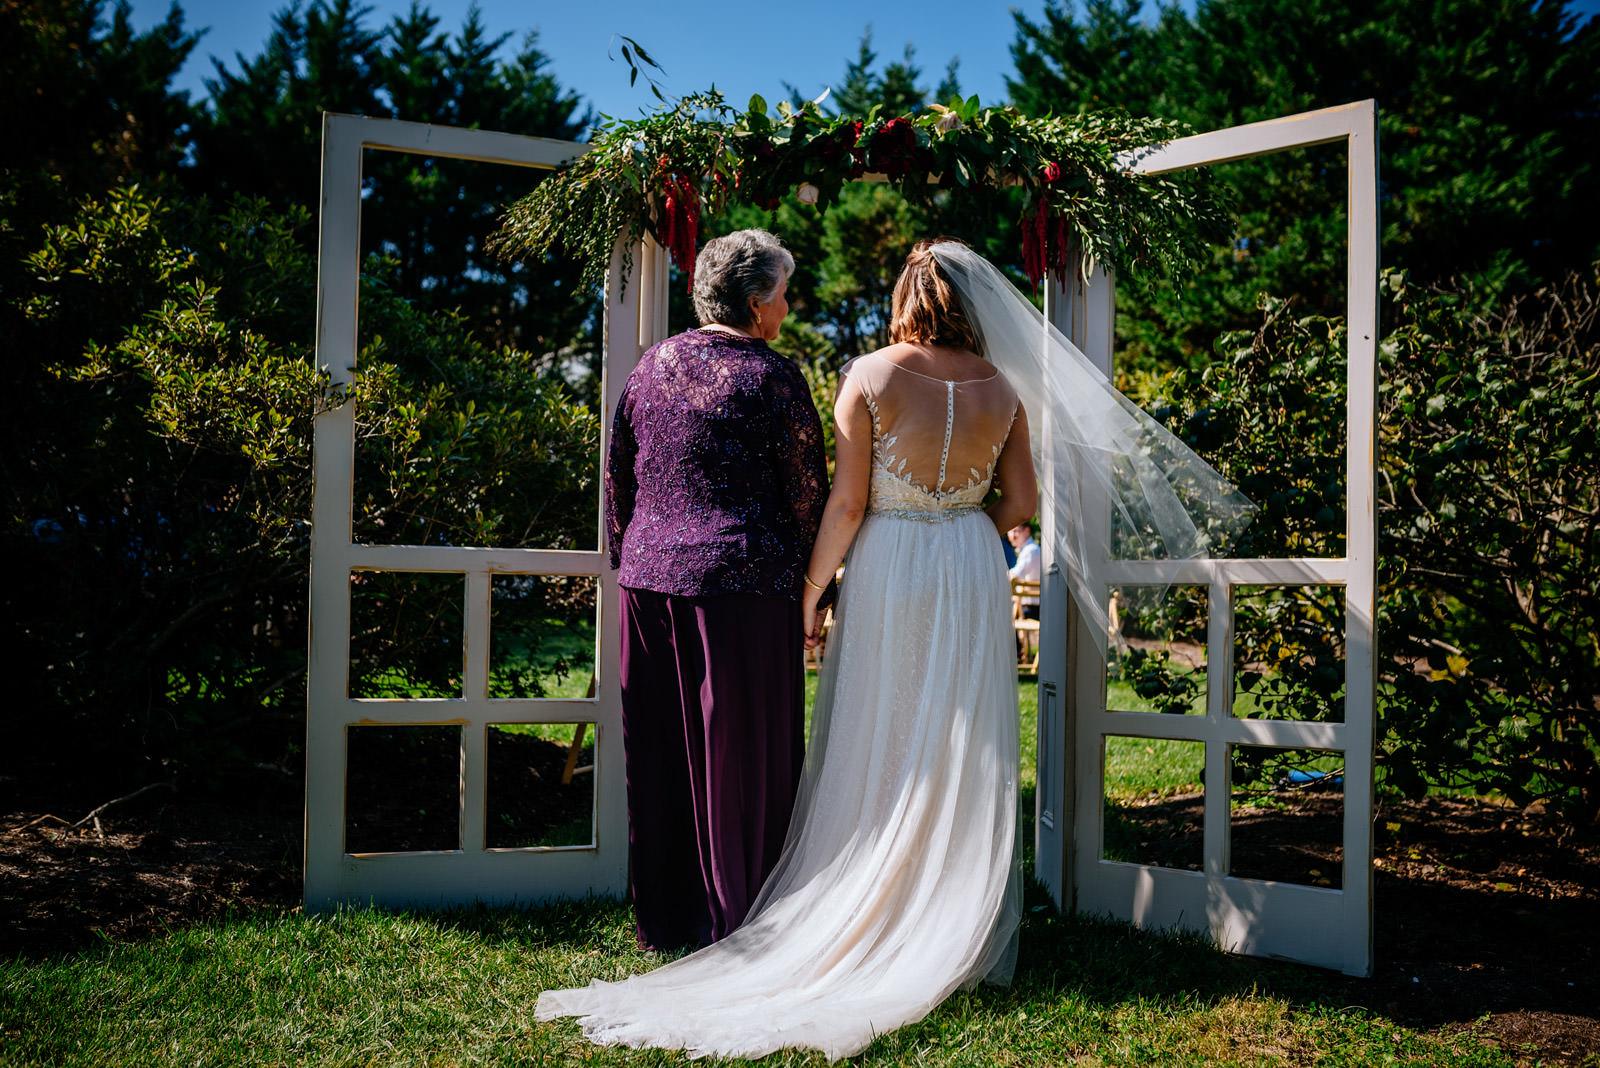 malden wv jq dickinson salt wedding